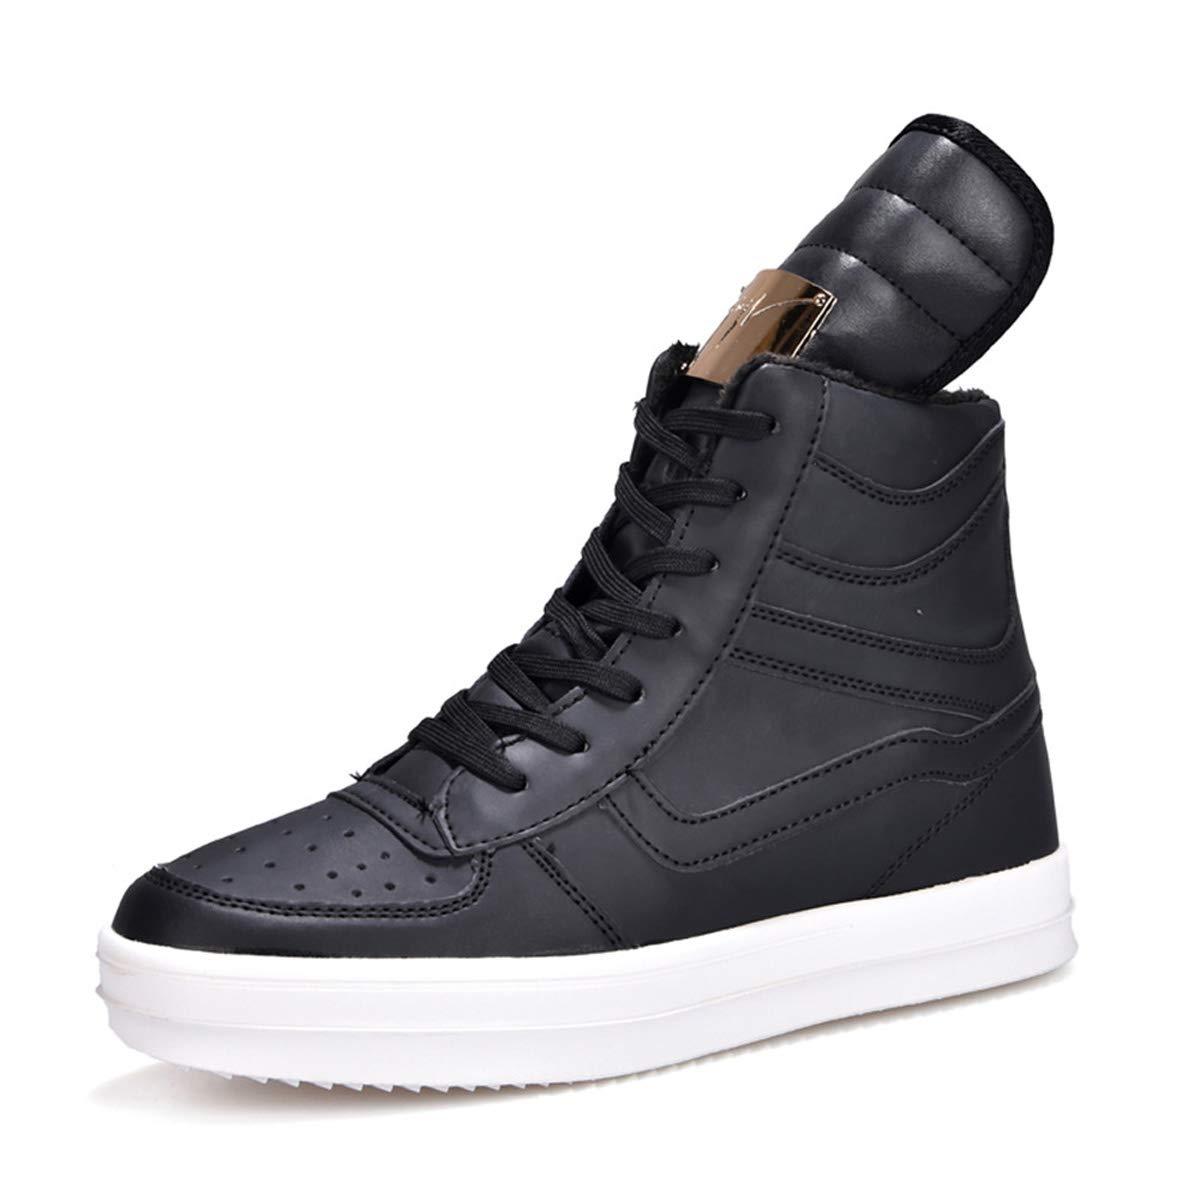 DANDANJIE Herren High Top Laufschuhe Sport Basketball Schuhe Mode Wanderschuhe Casual Retro Skateboard Schuhe